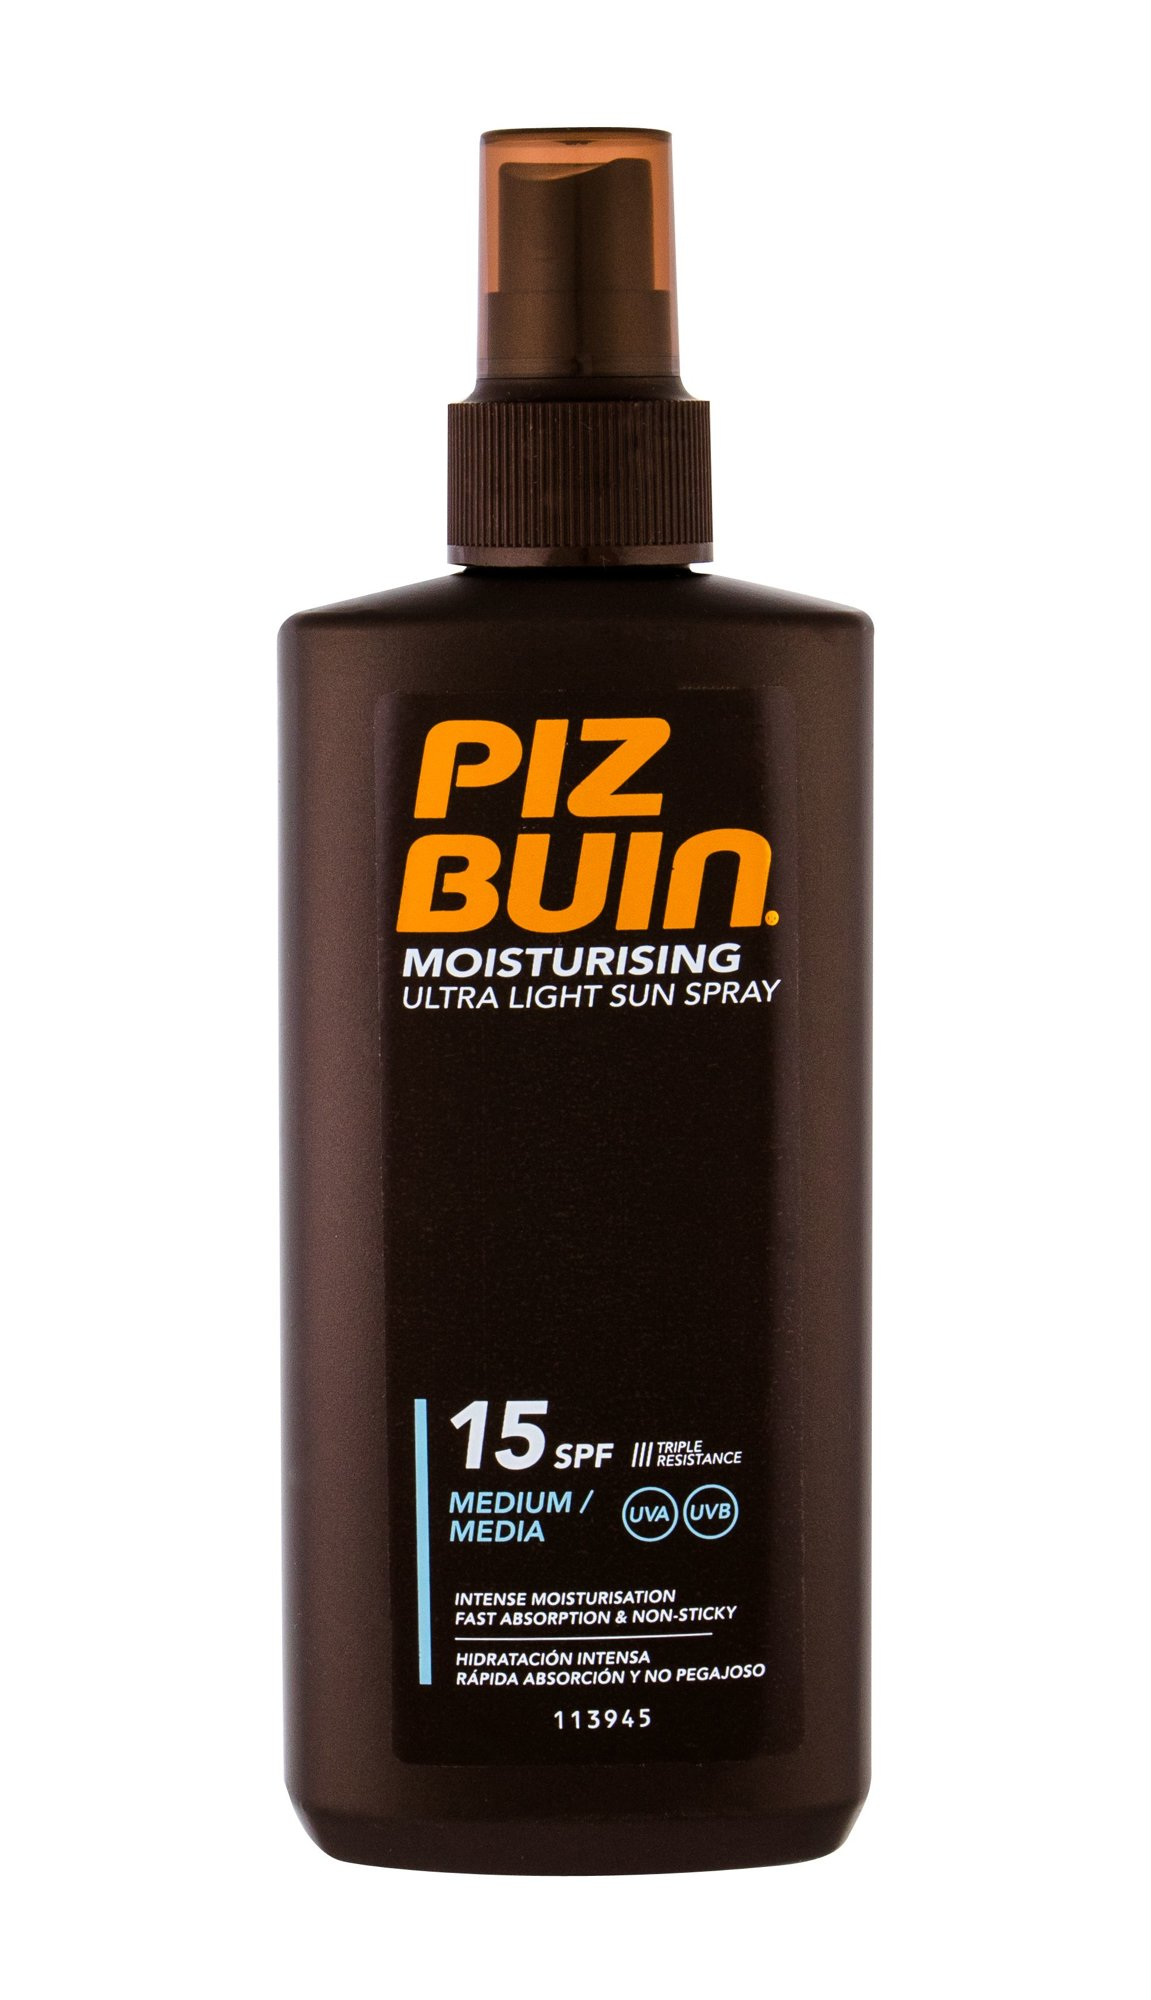 PIZ BUIN Moisturising Sun Body Lotion 200ml